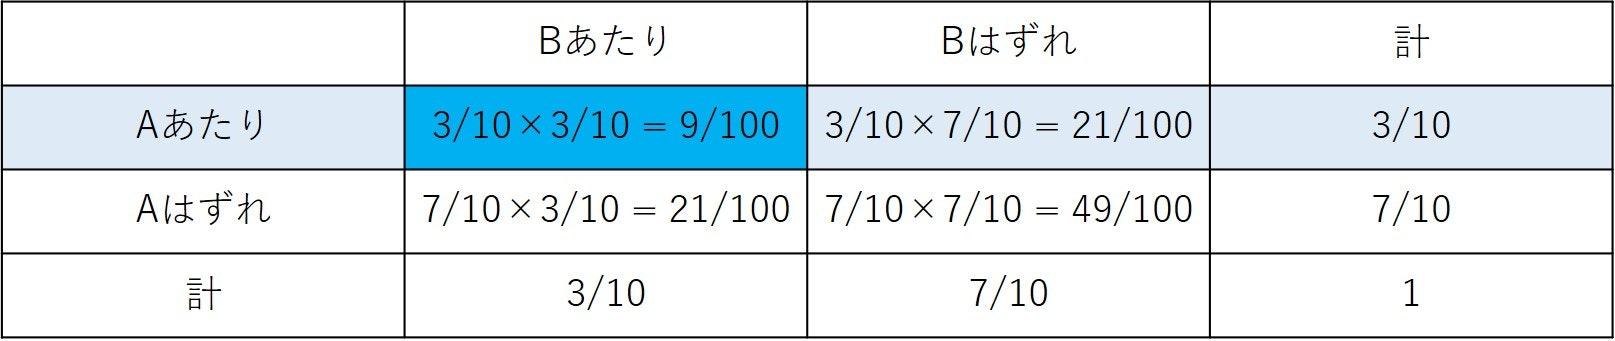 条件付き確率3.jpg